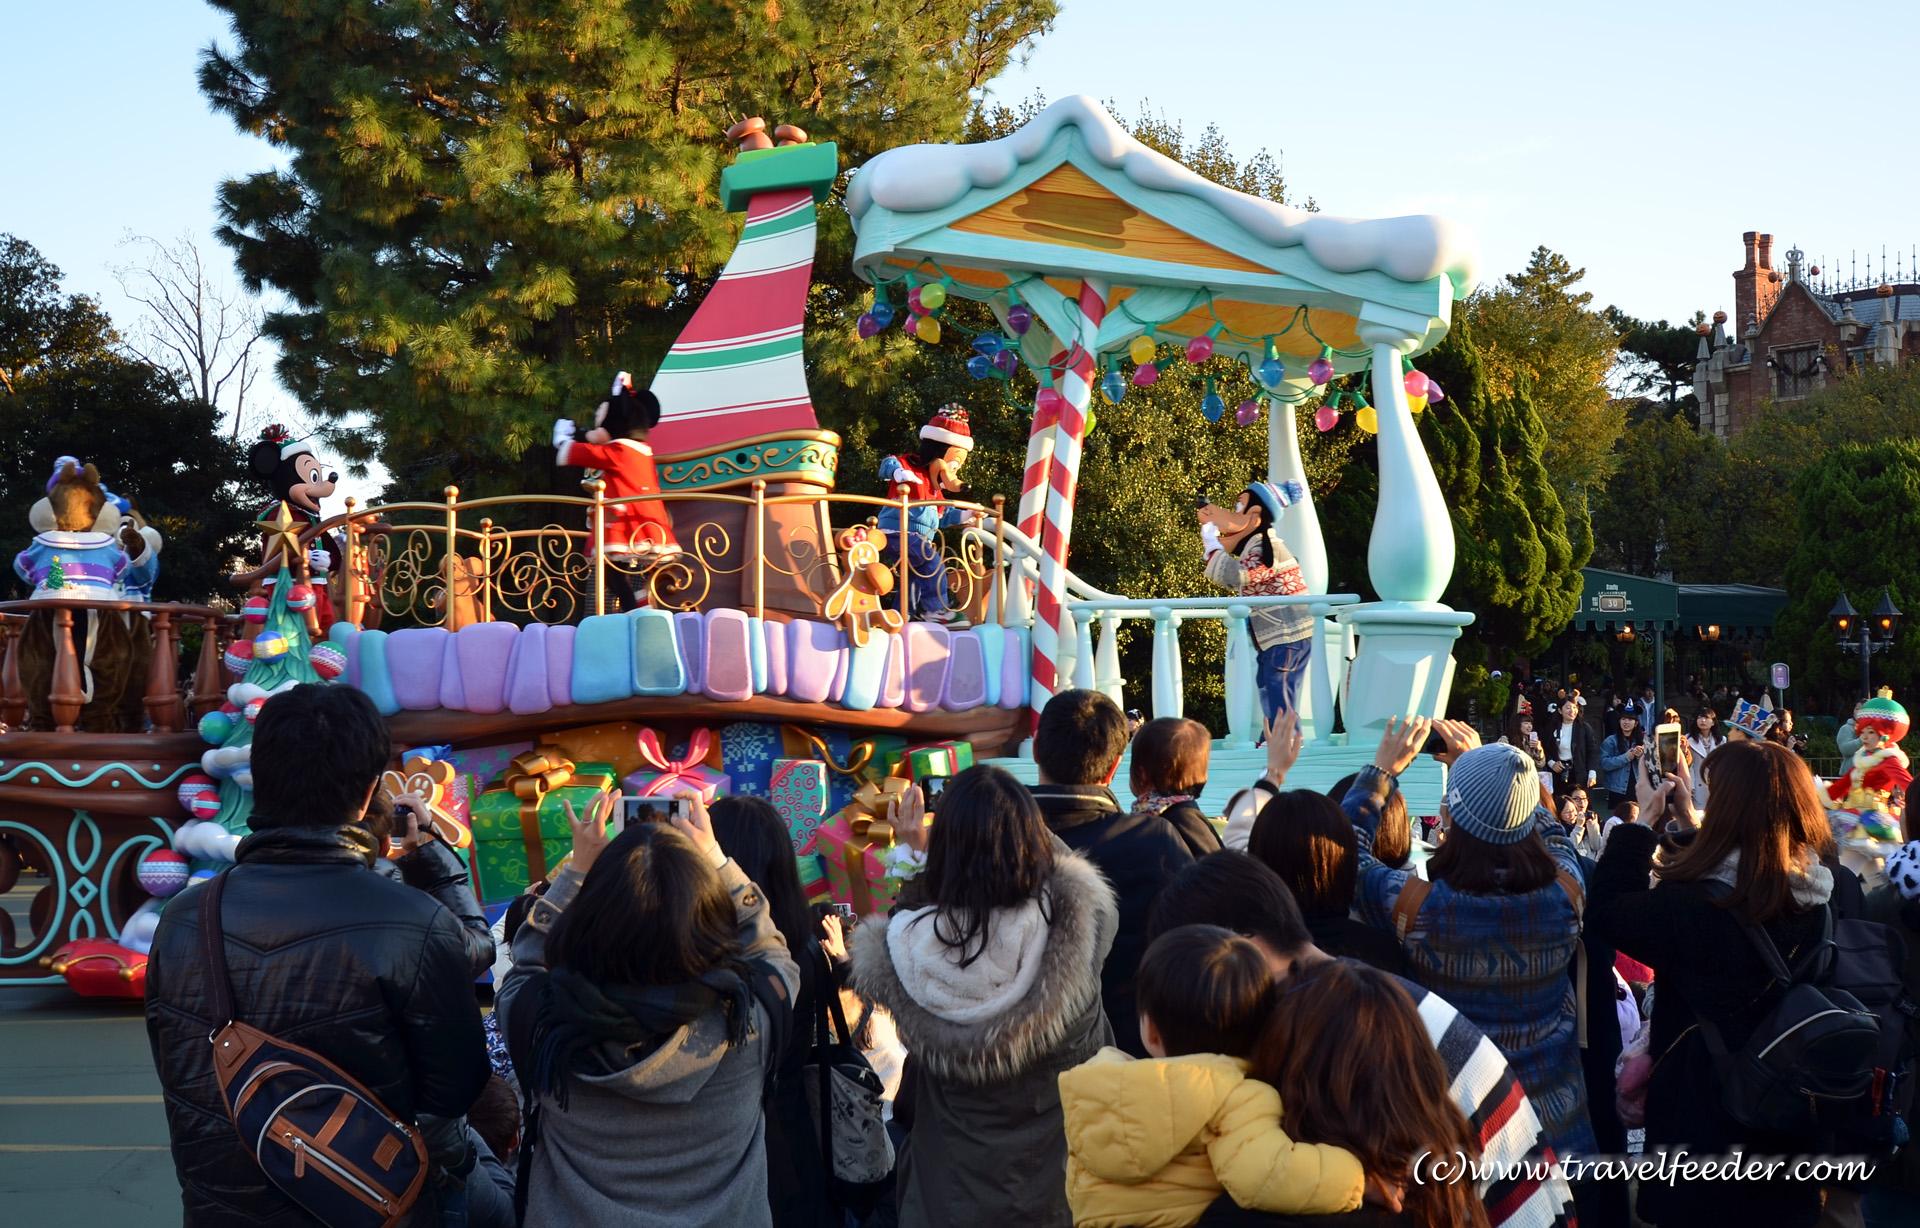 Family holiday in Disneyland